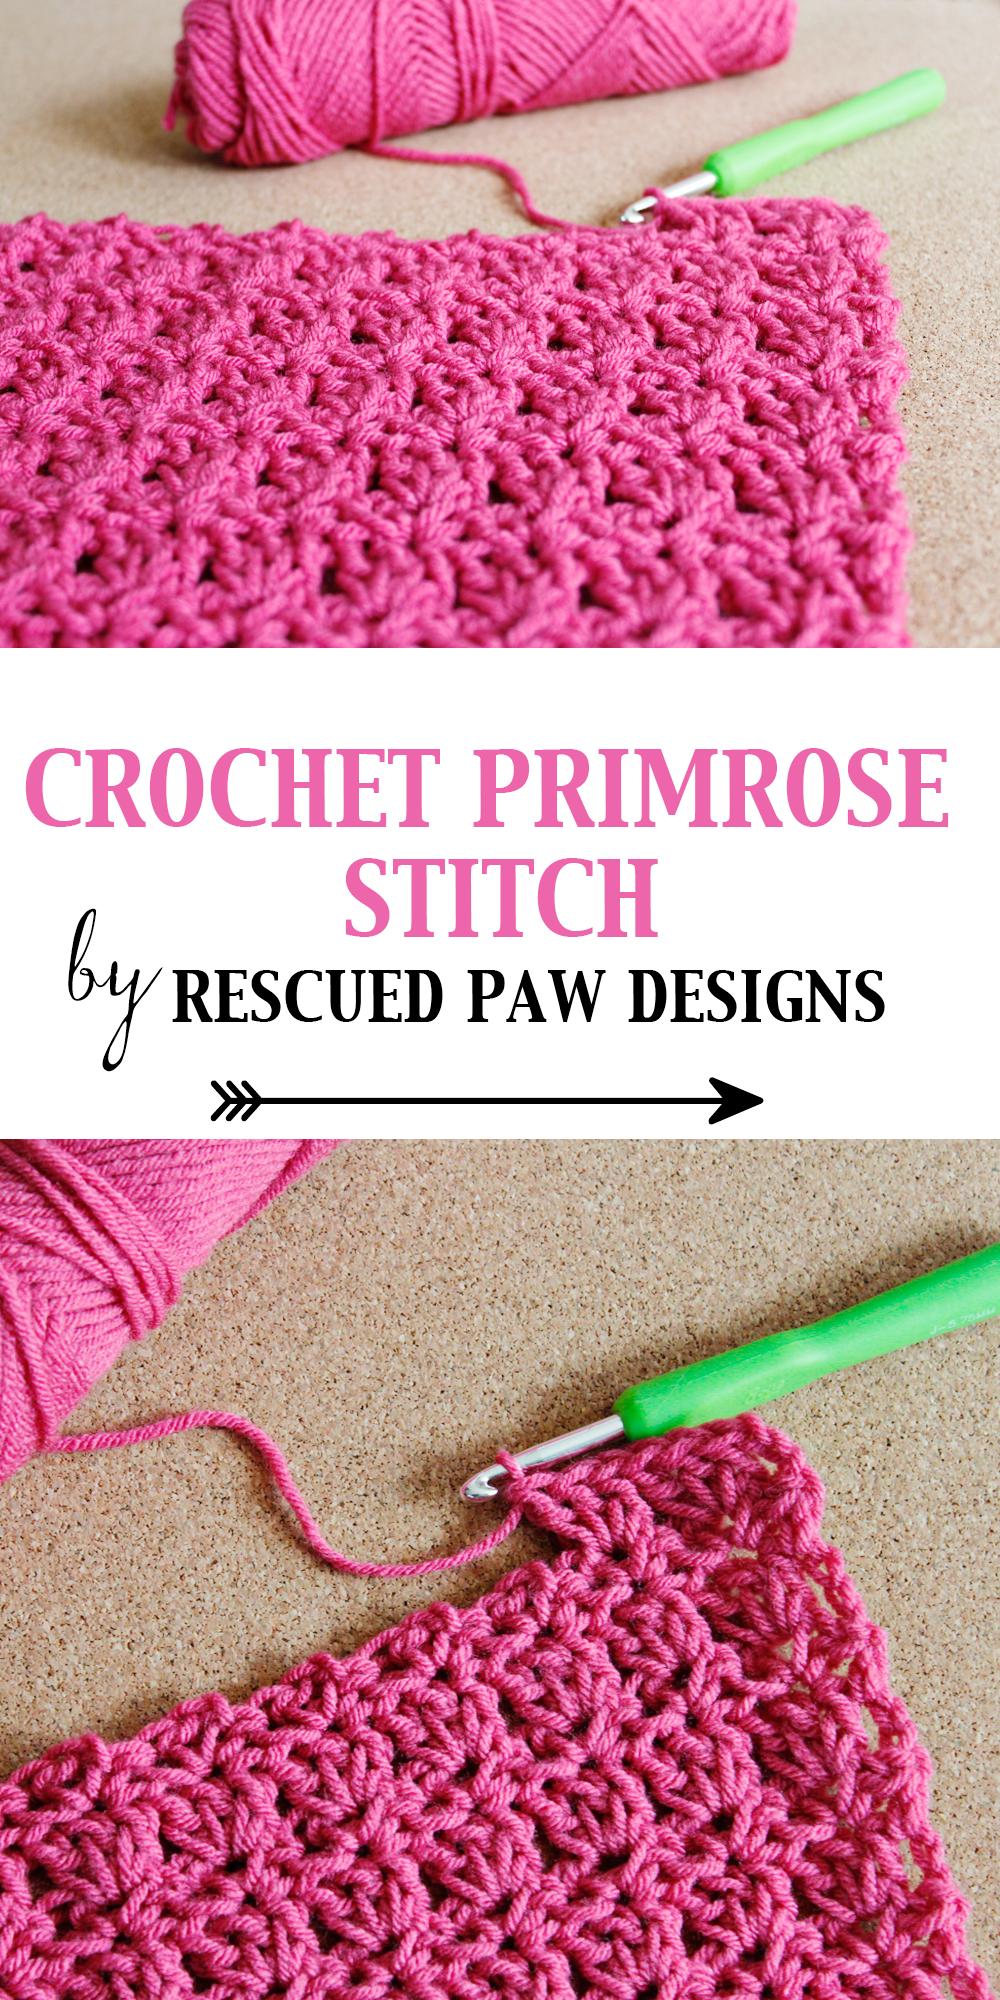 Crochet Primrose Stitch Tutorial - Free Pattern | Häkelmuster ...